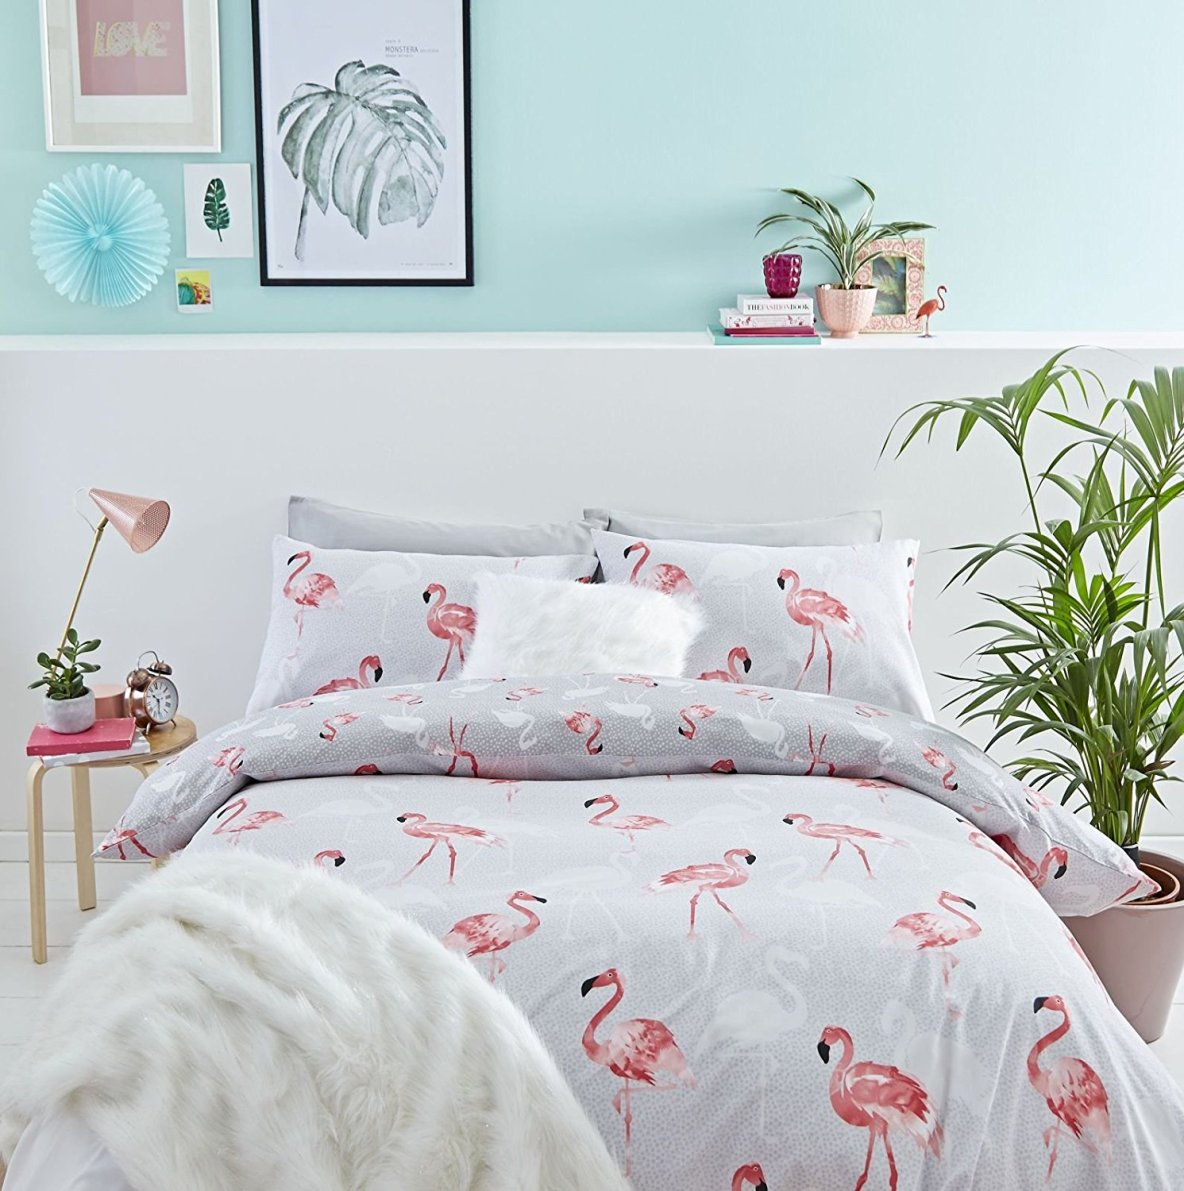 Flamingo Bedroom Decor, Flamingo Bedding Set